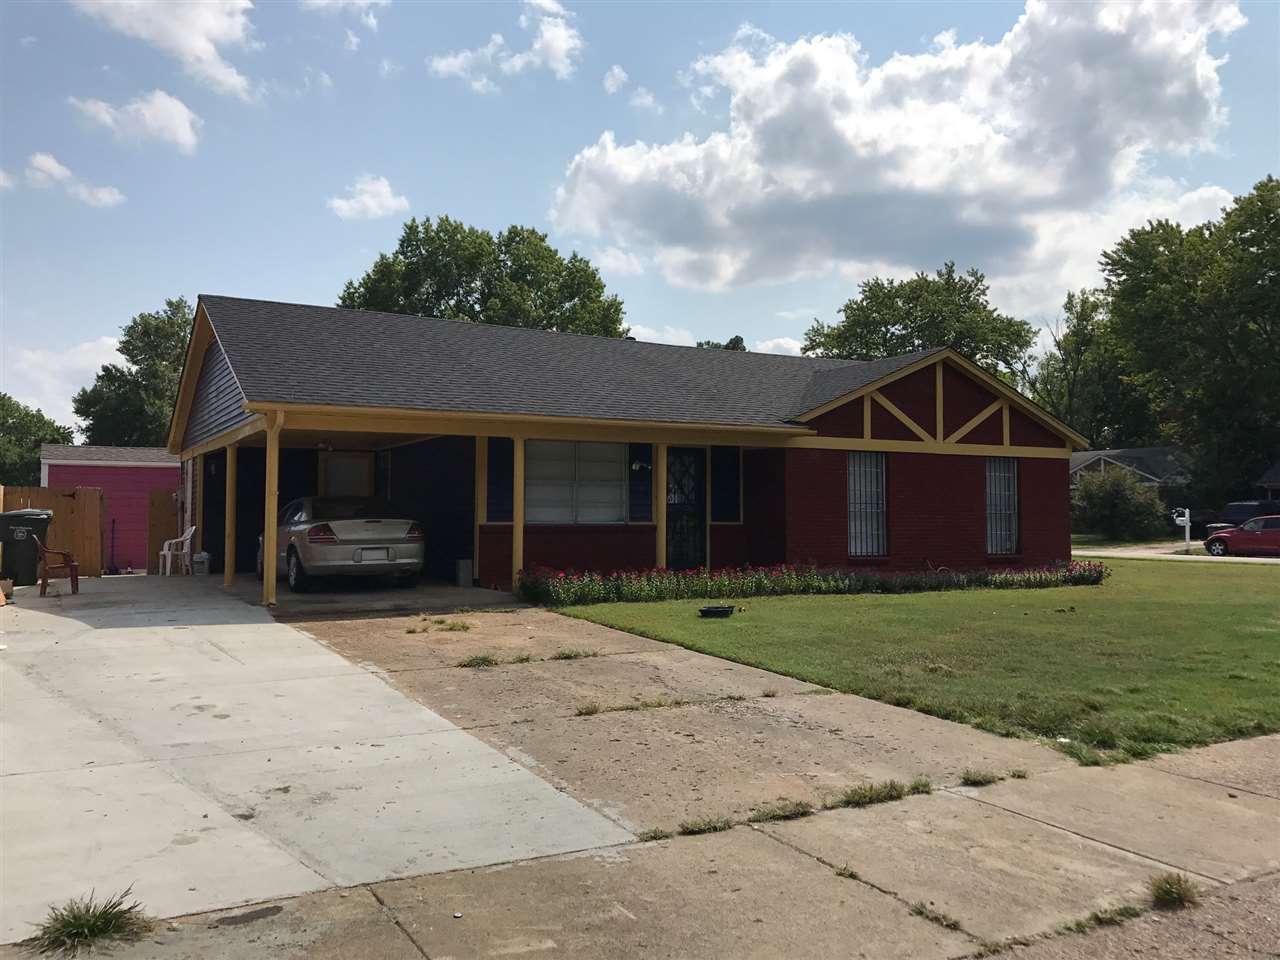 3481 Braycrest Memphis, TN 38128 - MLS #: 10008896